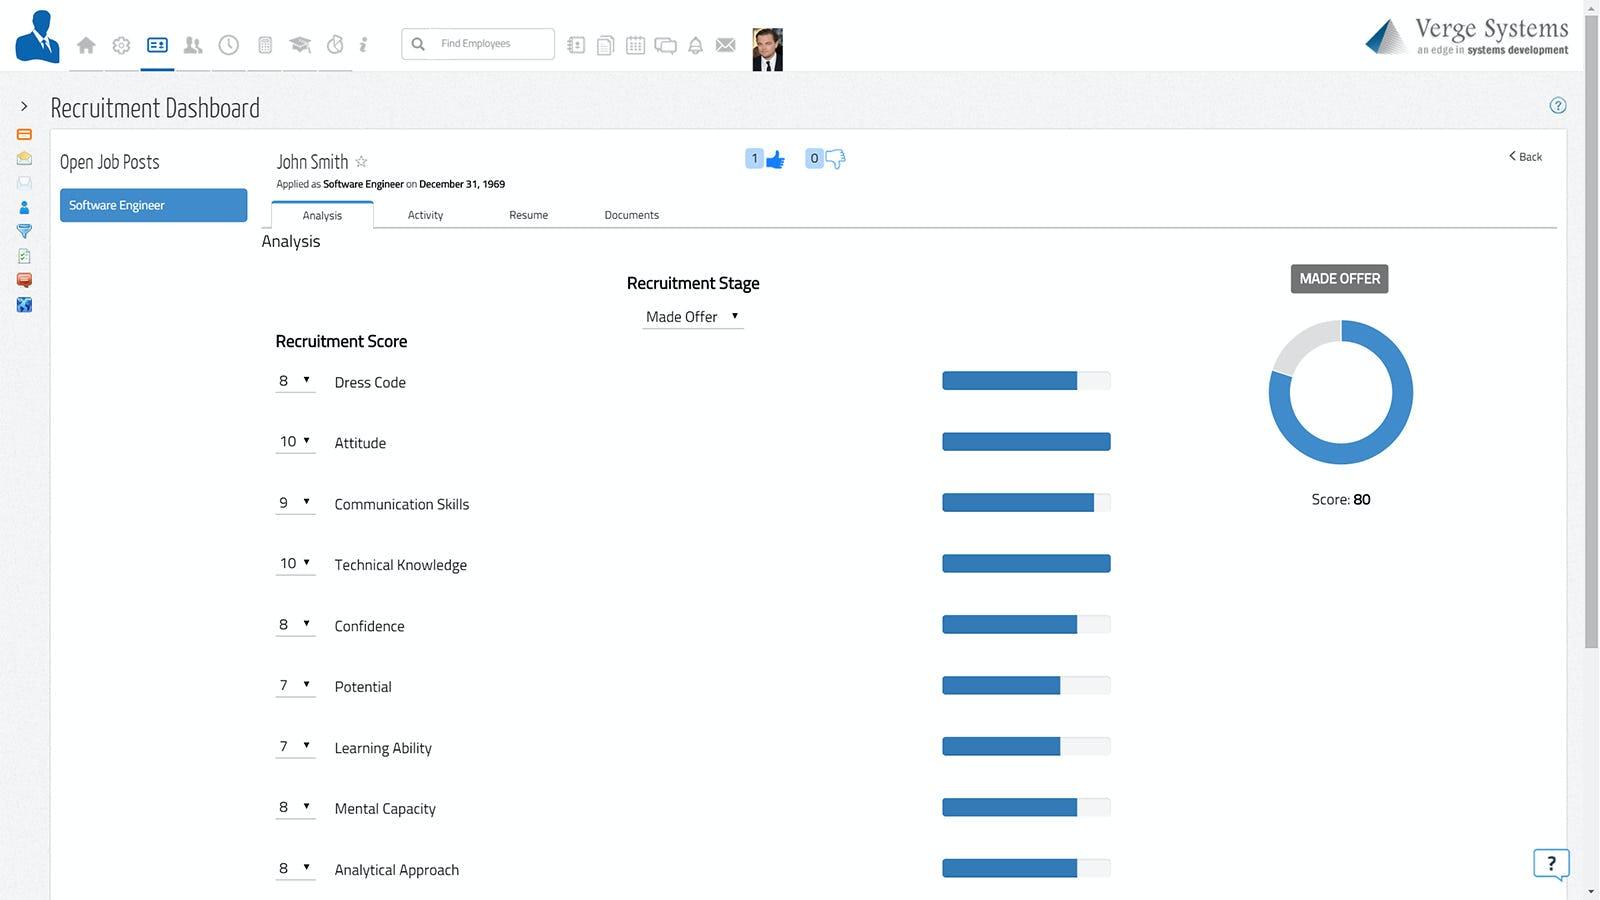 WebHR Software - Recruitment Dashboard